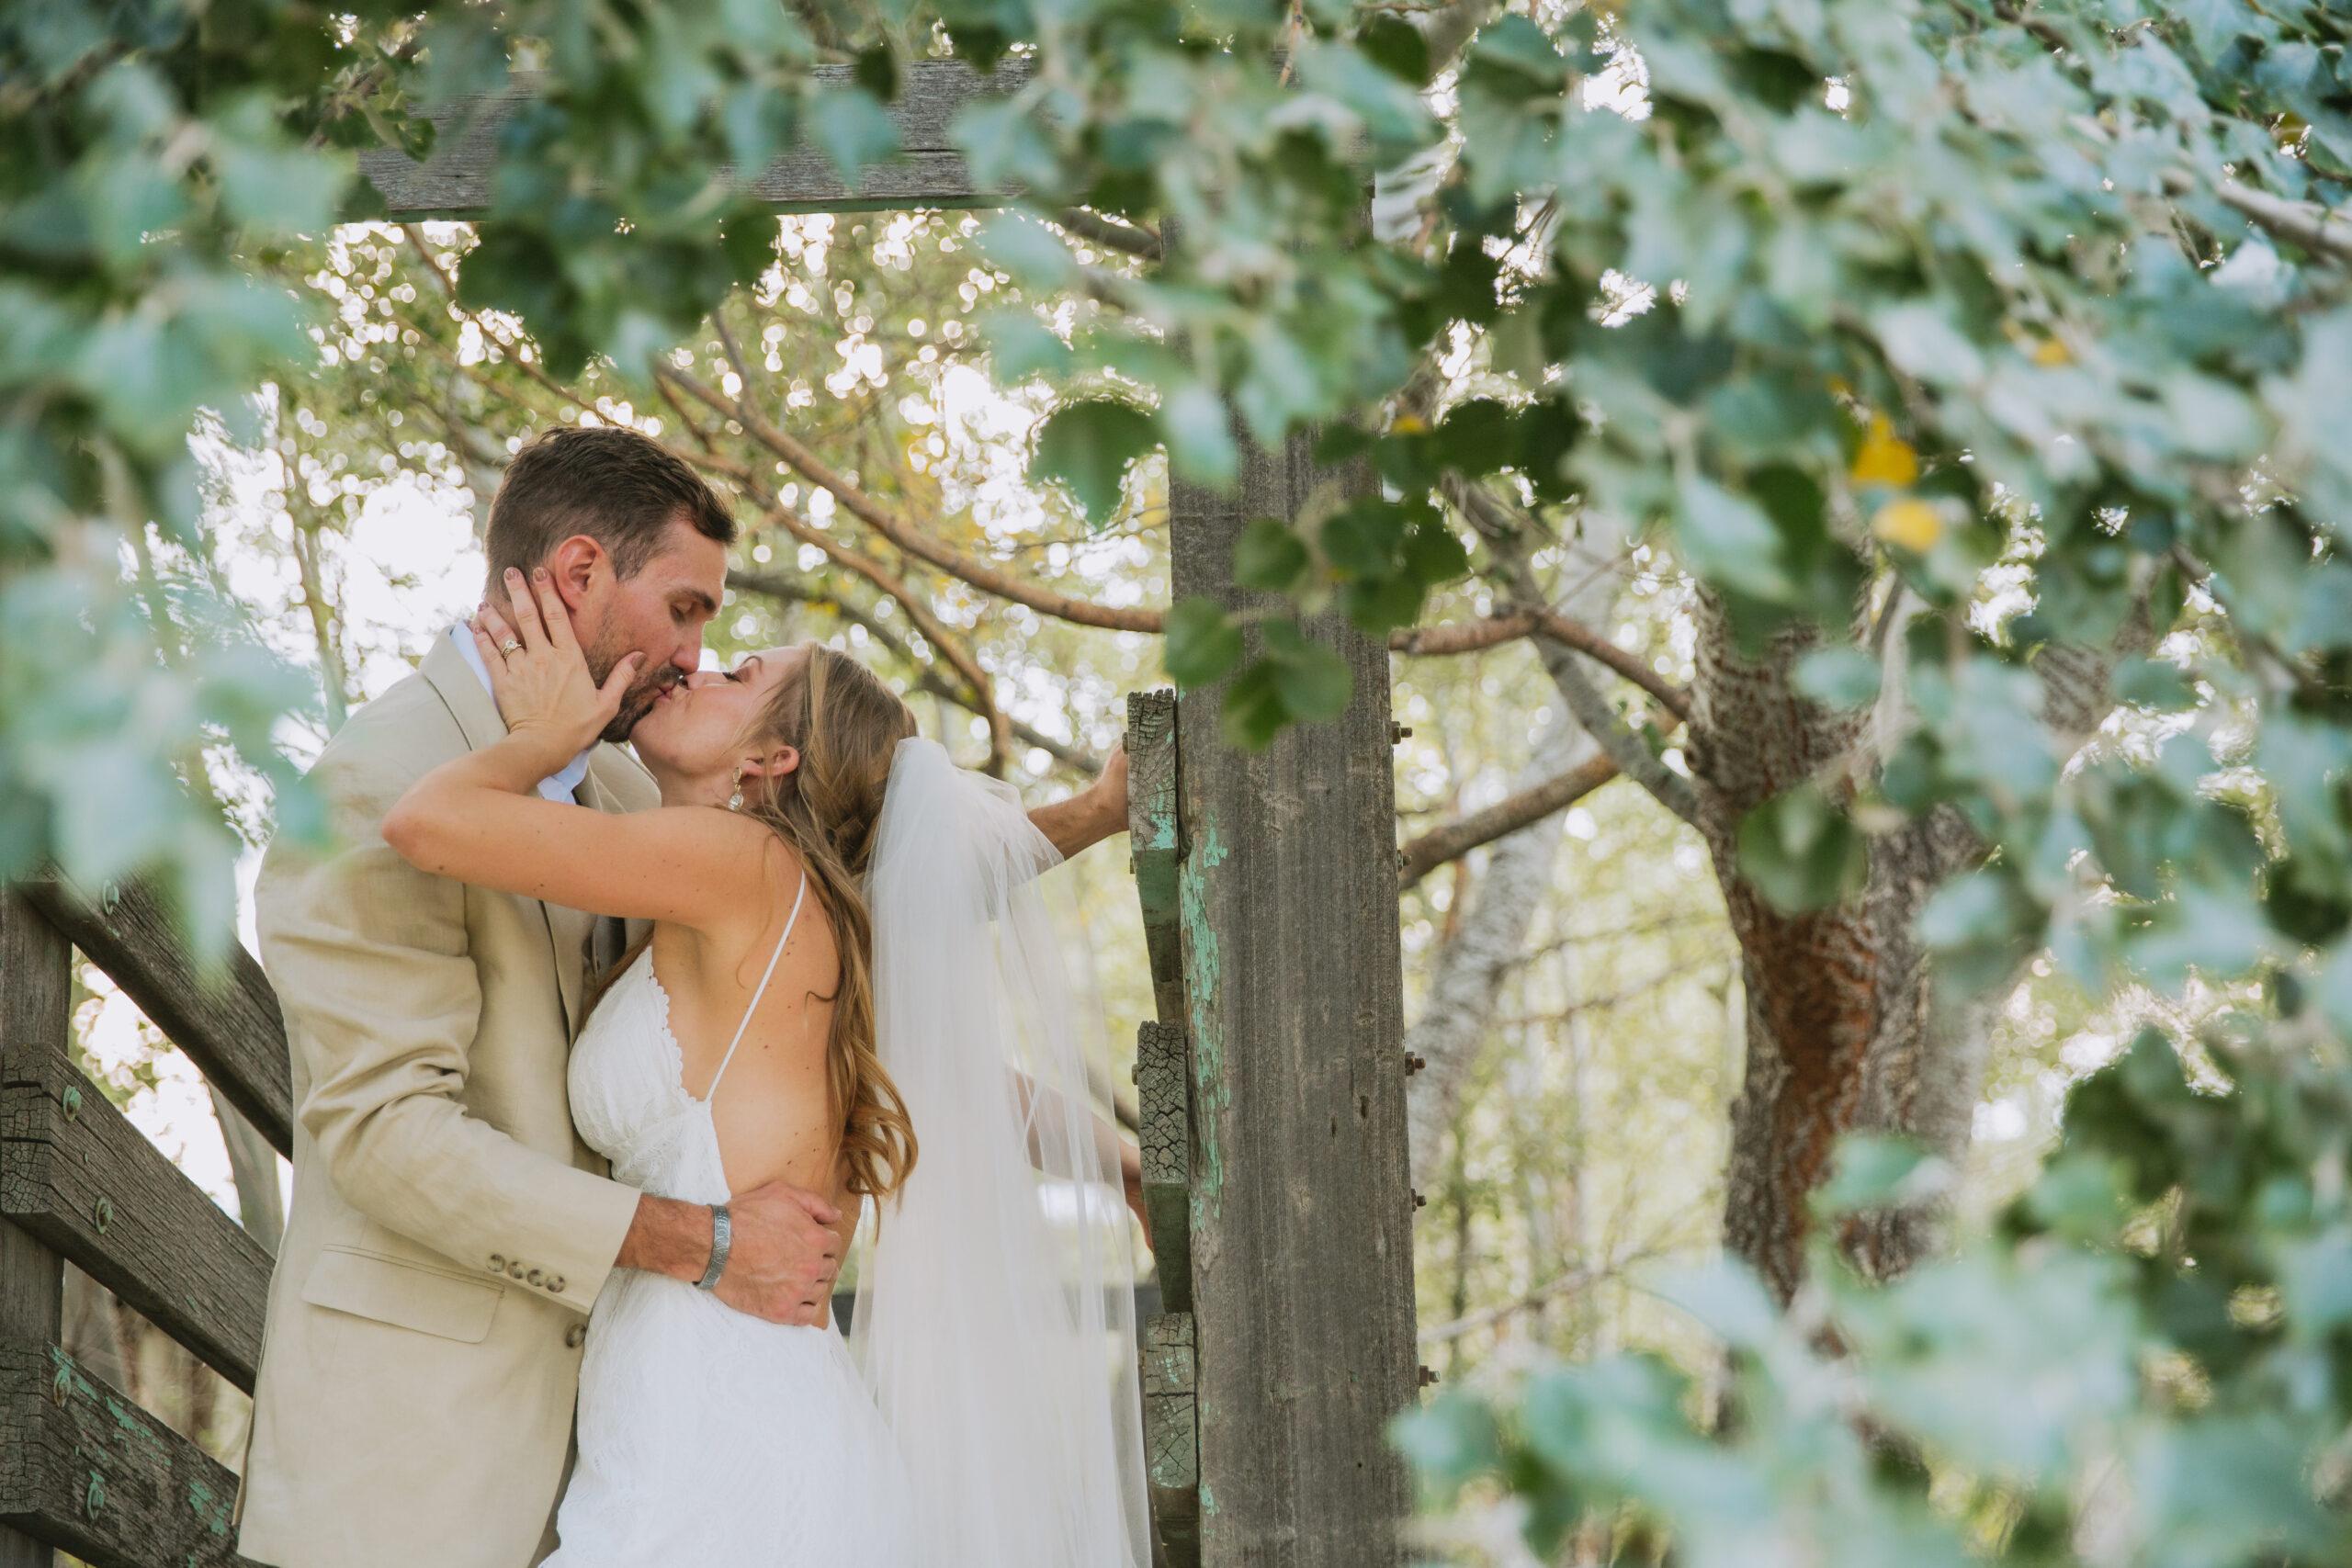 Christine + Jeremy | Rockin' S Ranch Micro Wedding in Johnstown Colorado